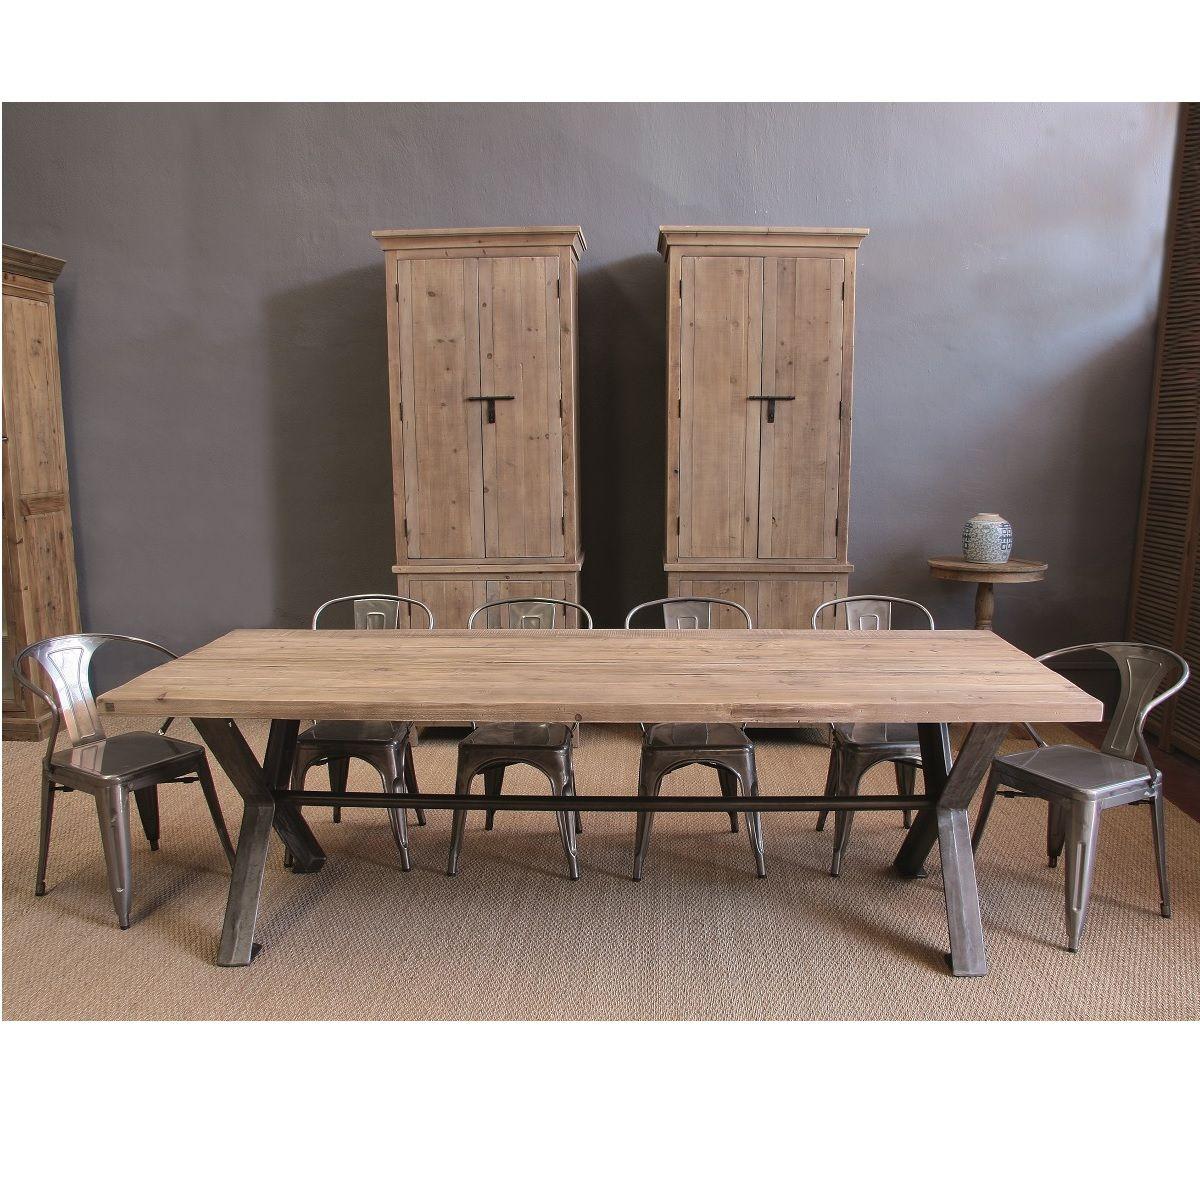 sw11120 1 mesa de madera maciza y acero 250x95x78 - Mesas De Madera Maciza